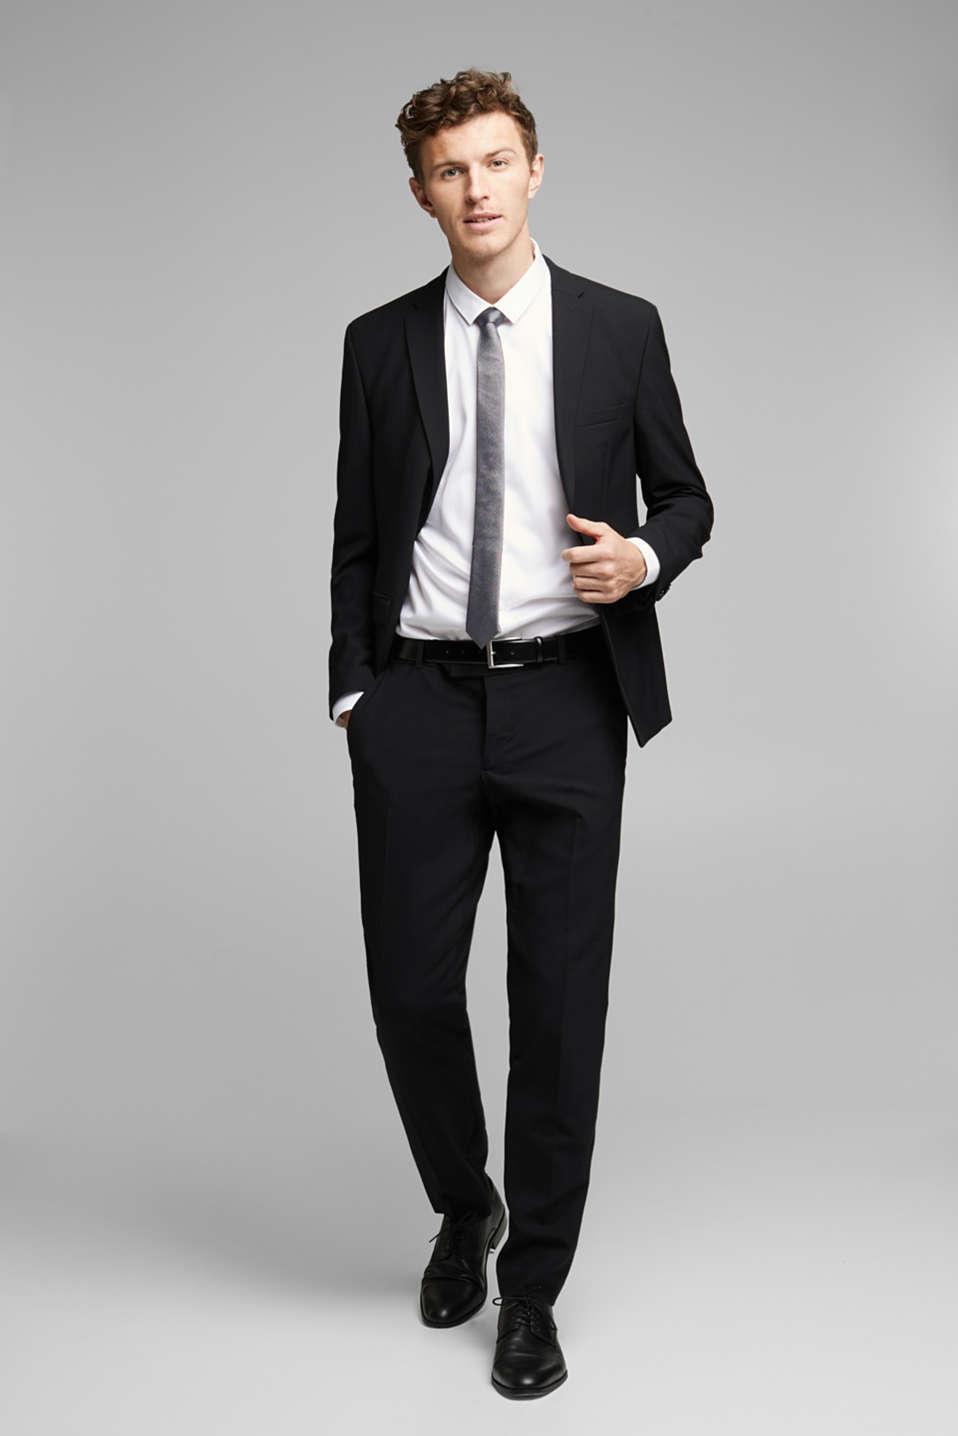 ACTIVE SUIT tailored jacket, wool blend, BLACK, detail image number 1